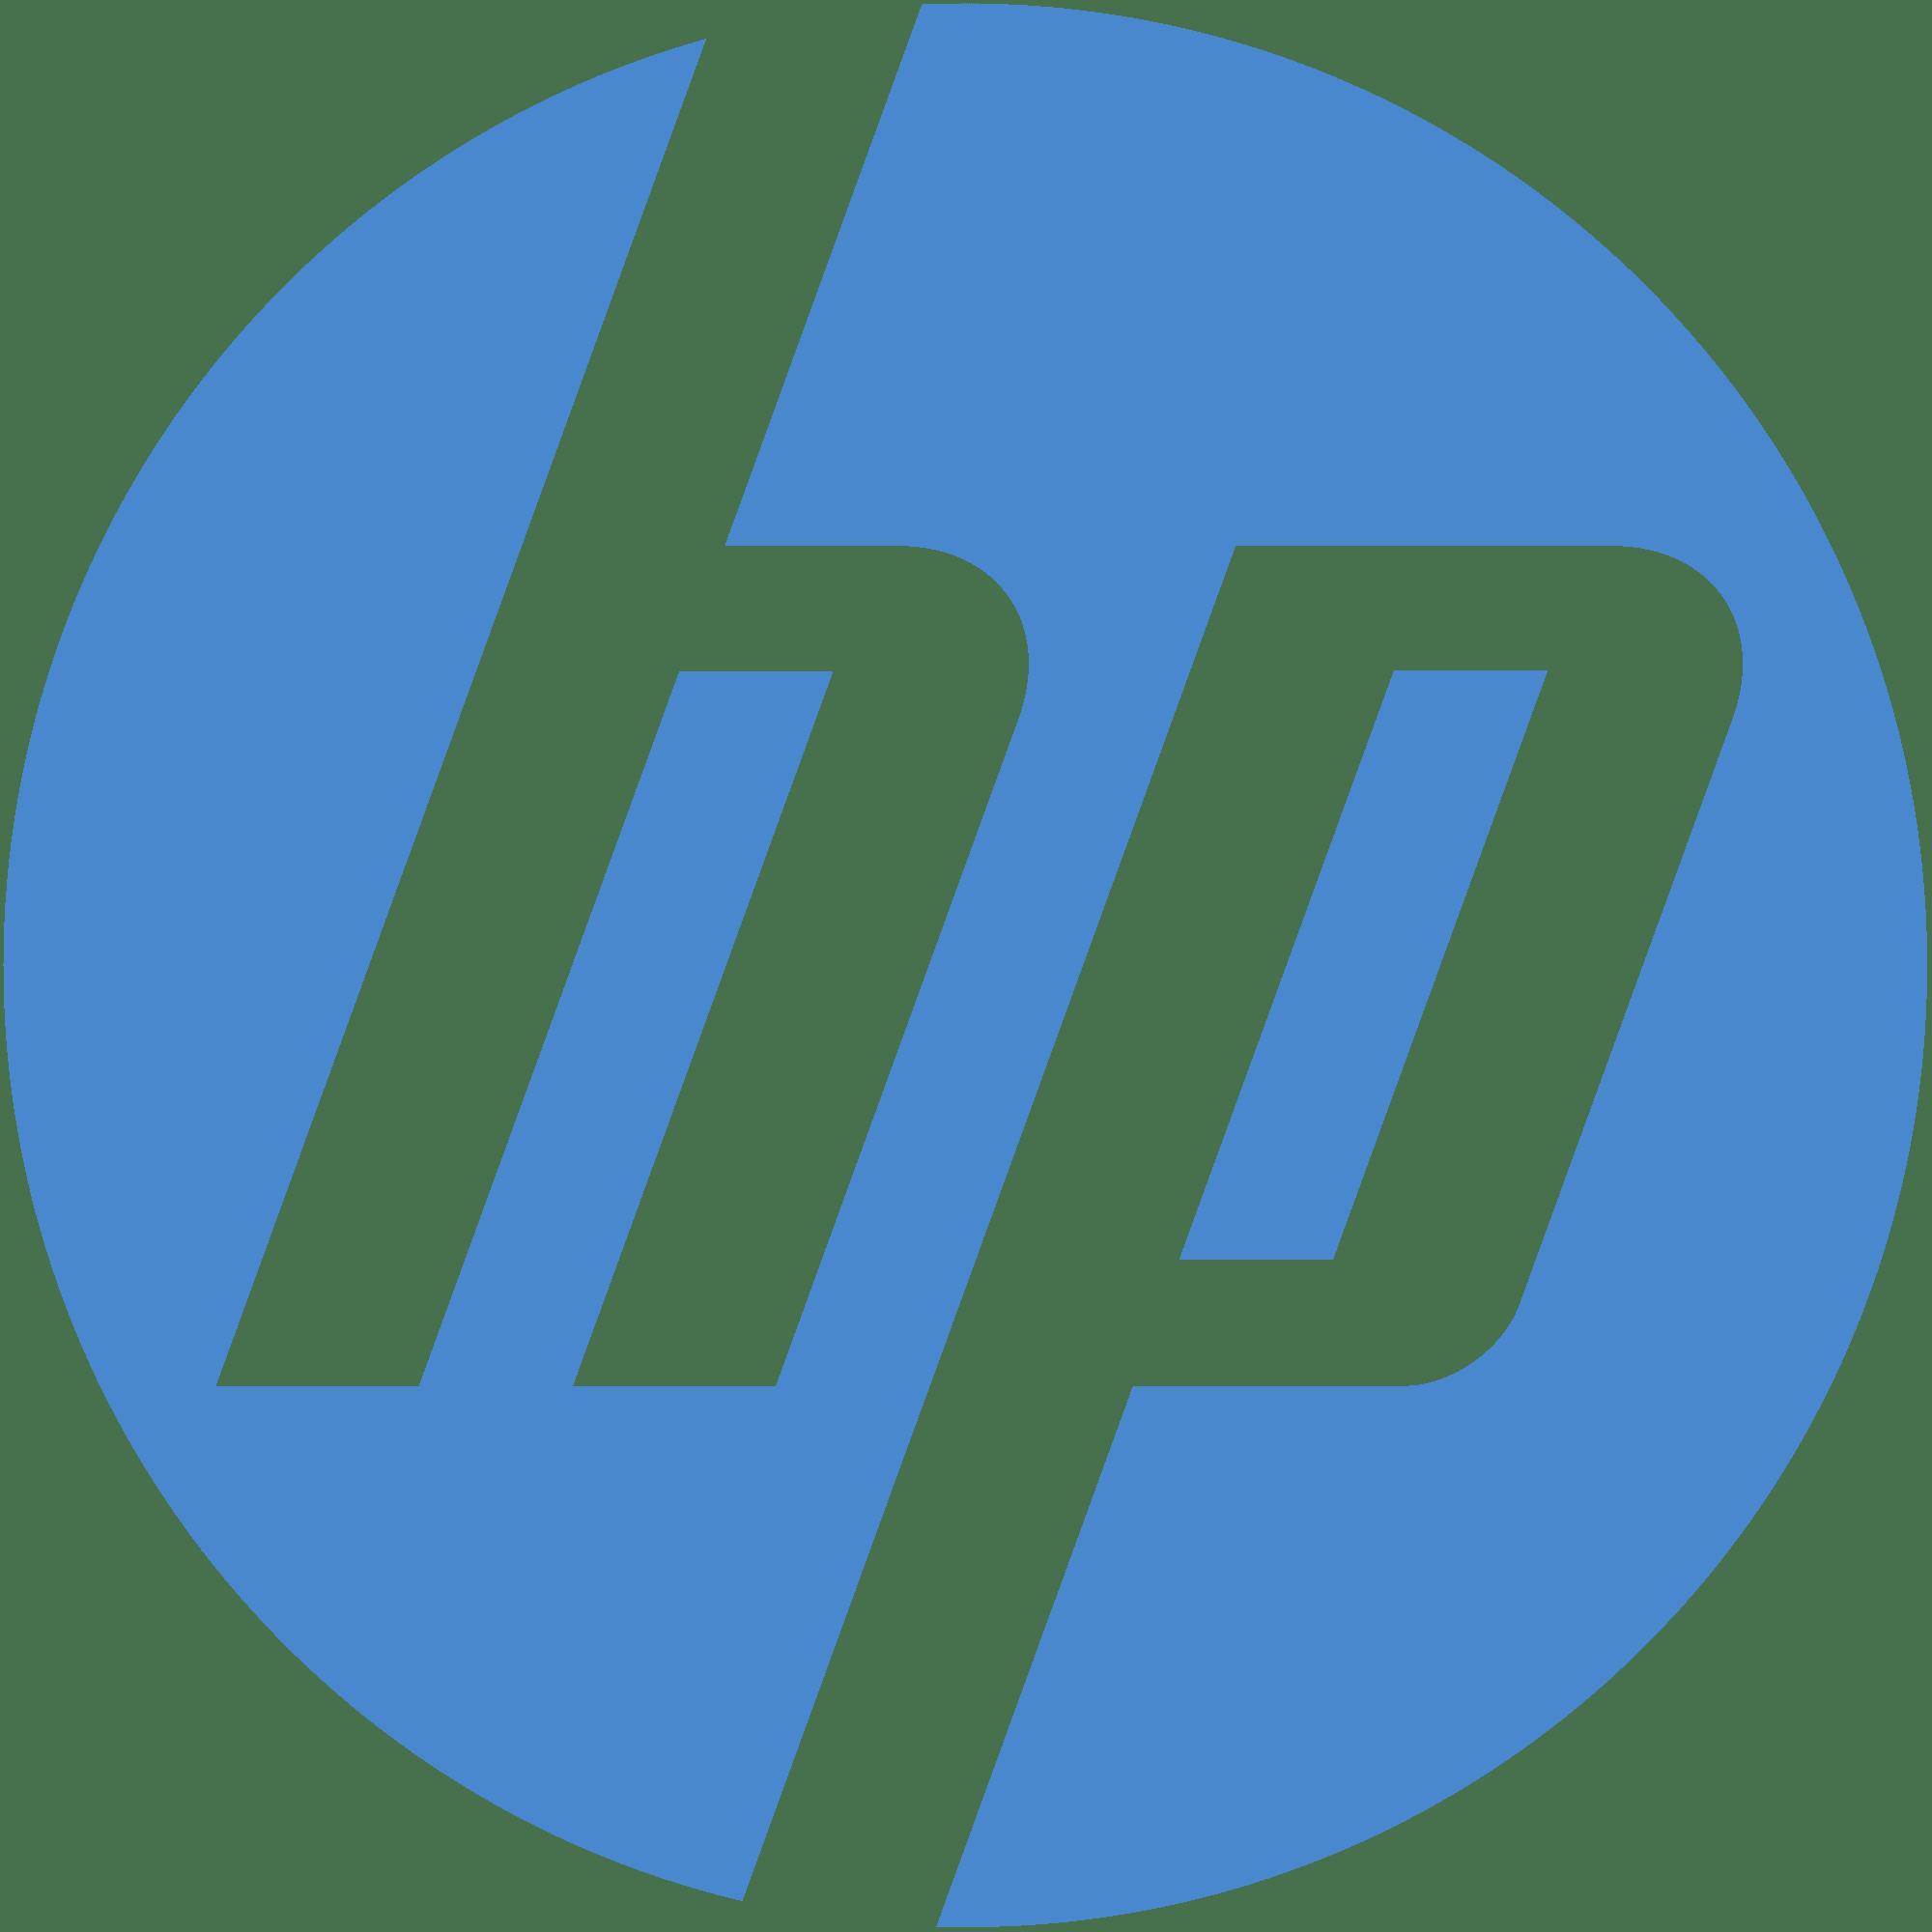 HP Deskjet Ink Advantage 2010 Printer K010a drivers